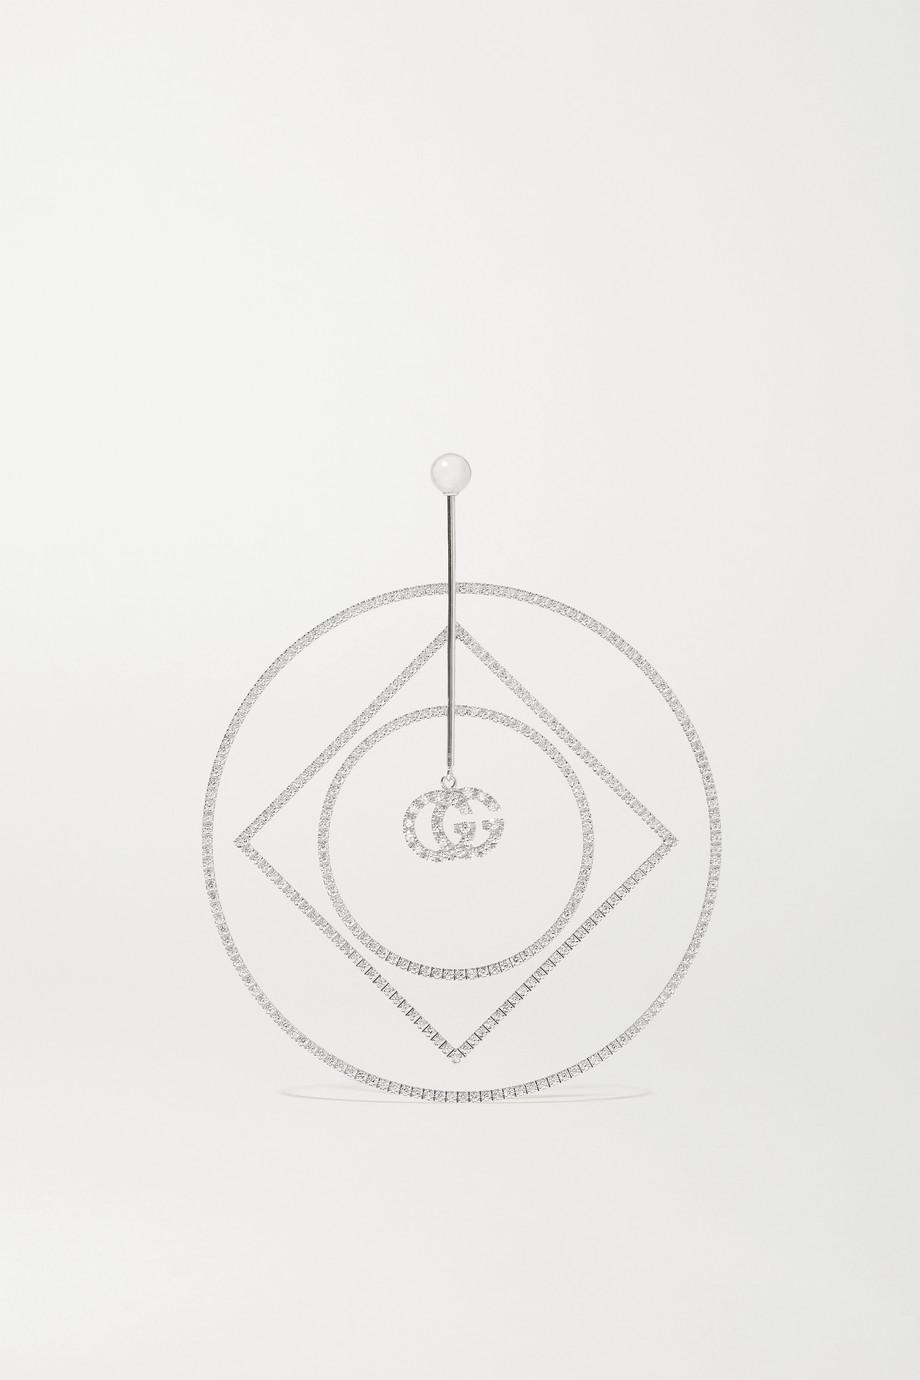 Gucci GG Running 18-karat white gold diamond earring